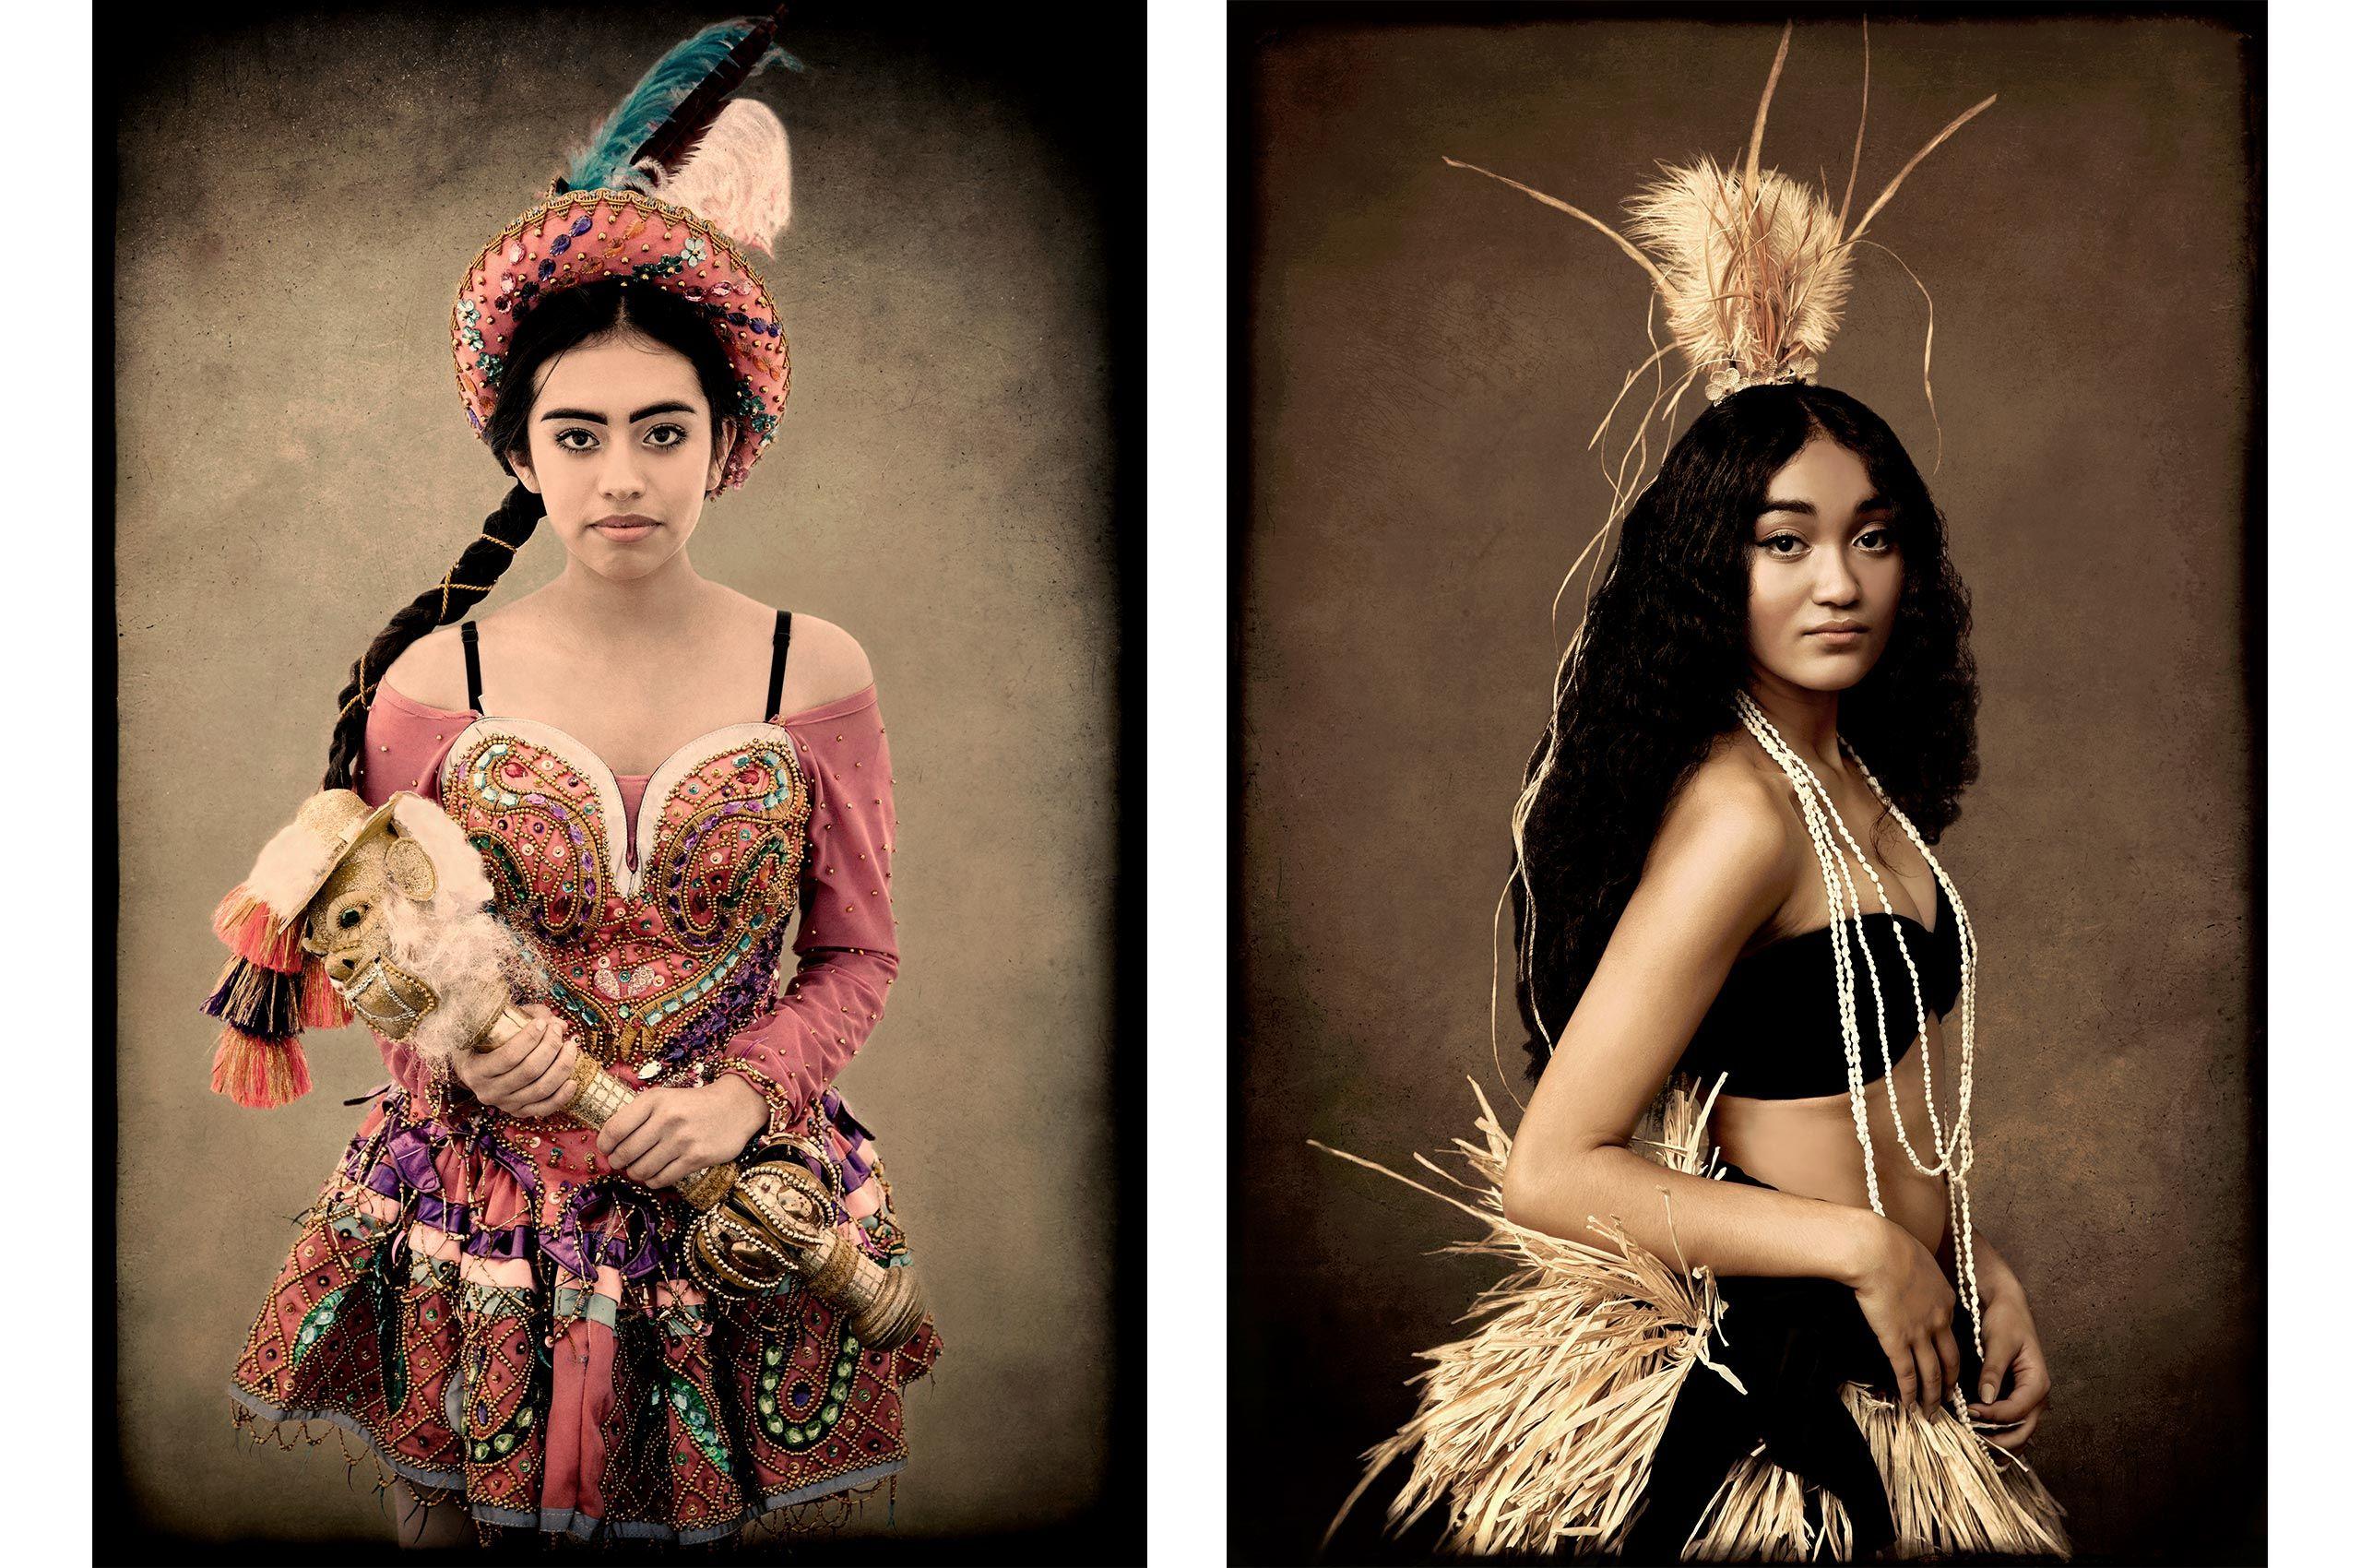 Yarenni-Bolivian Heritage,  Kehaulani-Polynesian Heritage